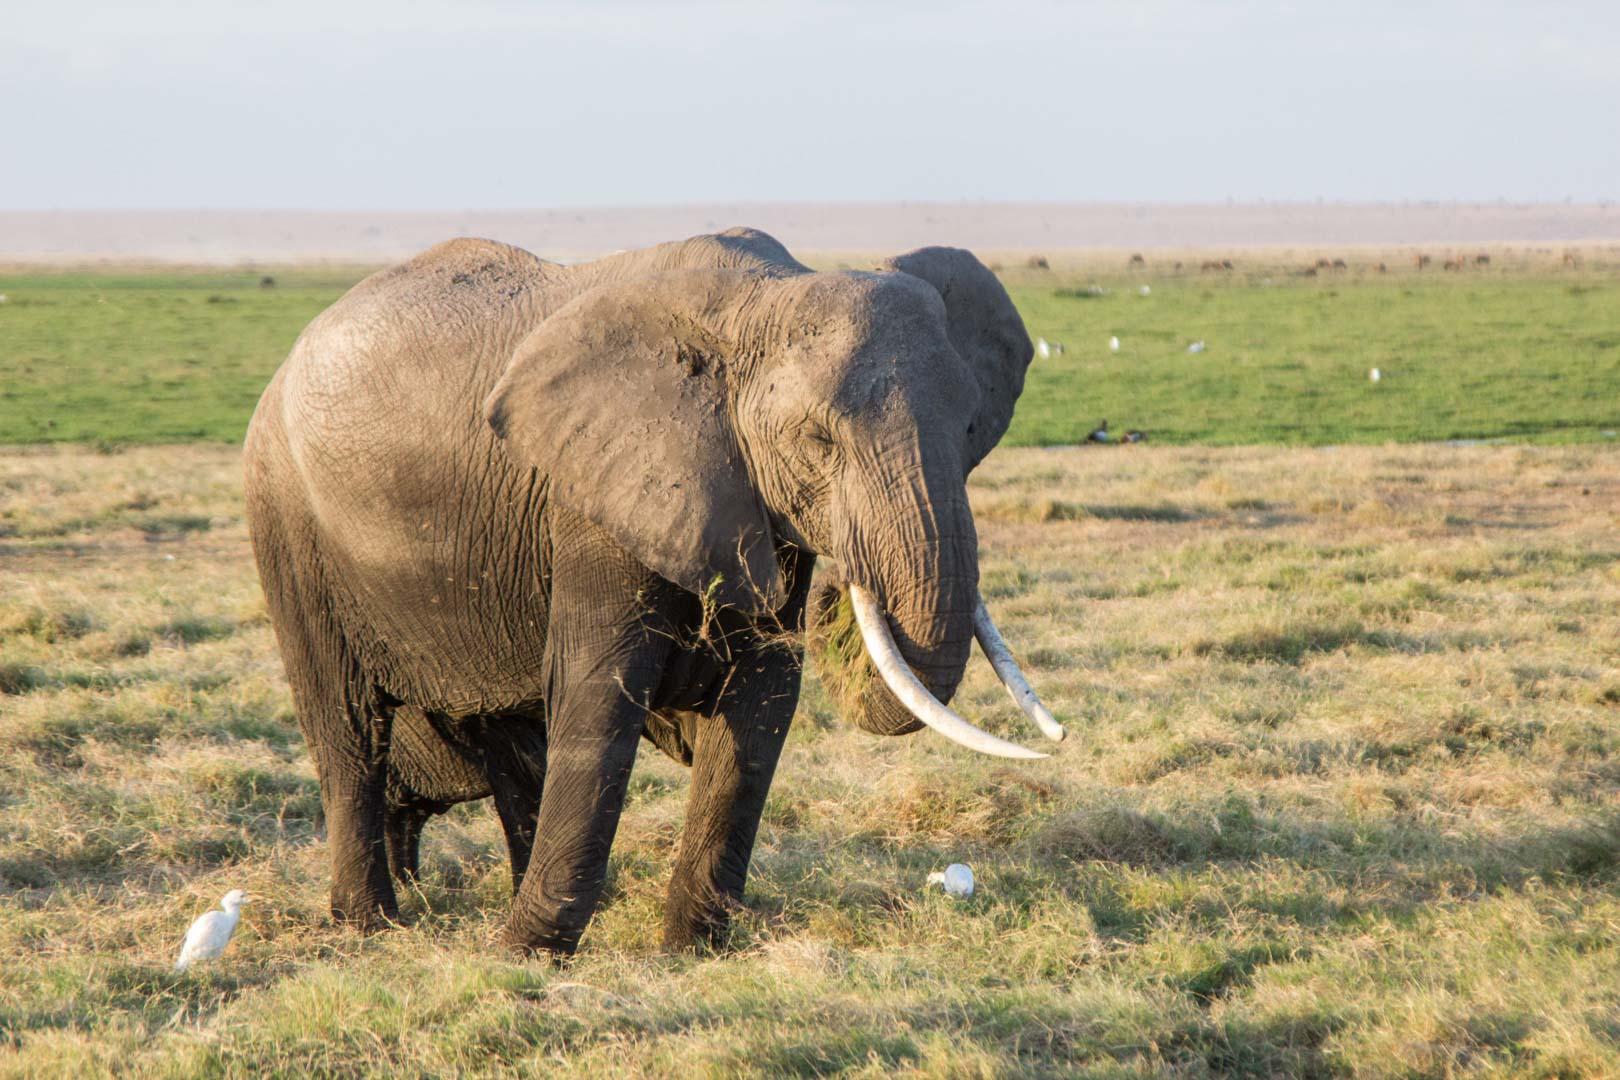 Elefante comiendo, Parque Nacional de Amboseli, Kenia